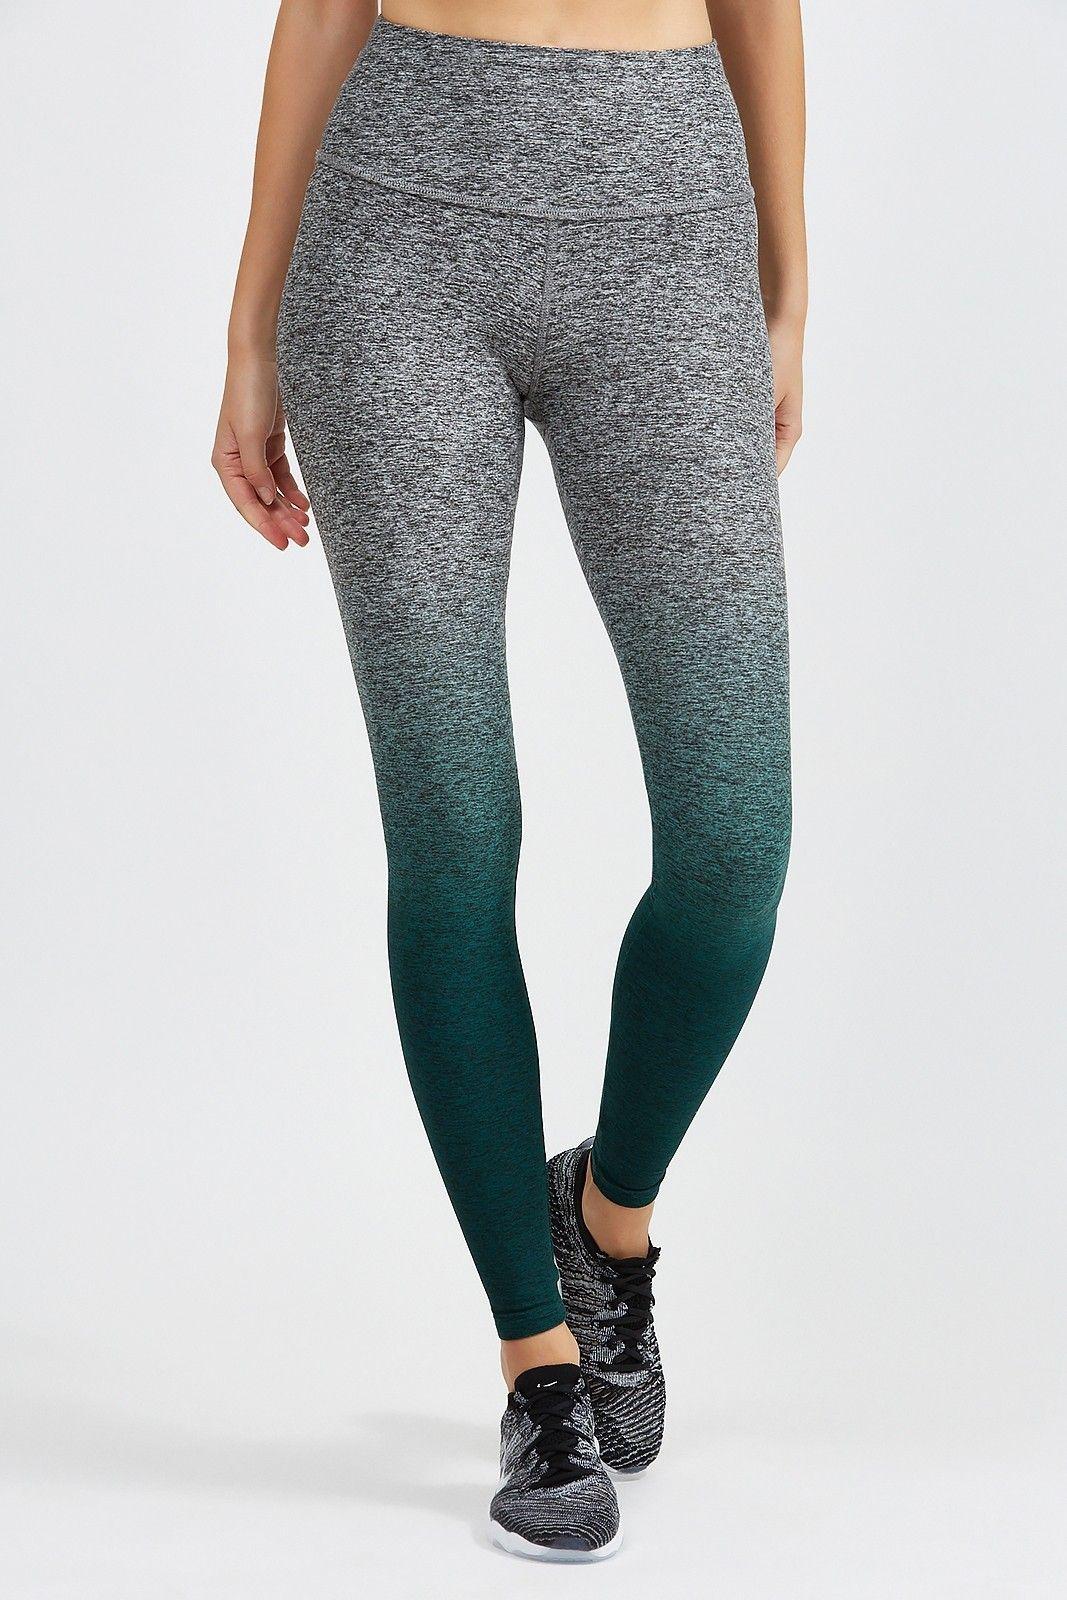 4025b64dc2b199 Beyond Yoga | CPL Womens | Leggings, Clothes, Sweatpants